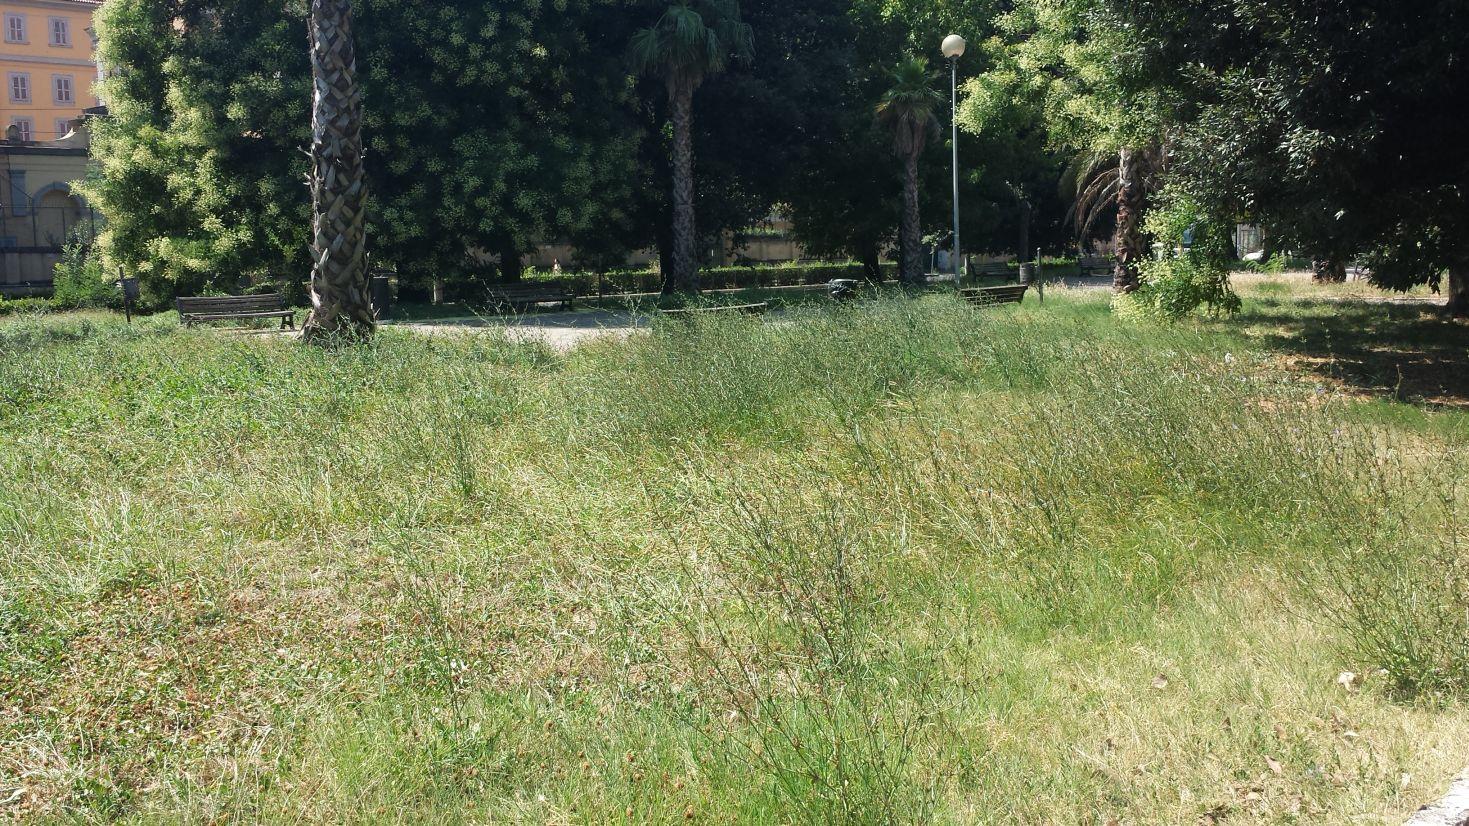 Giardini viale Tiziano degrado 7